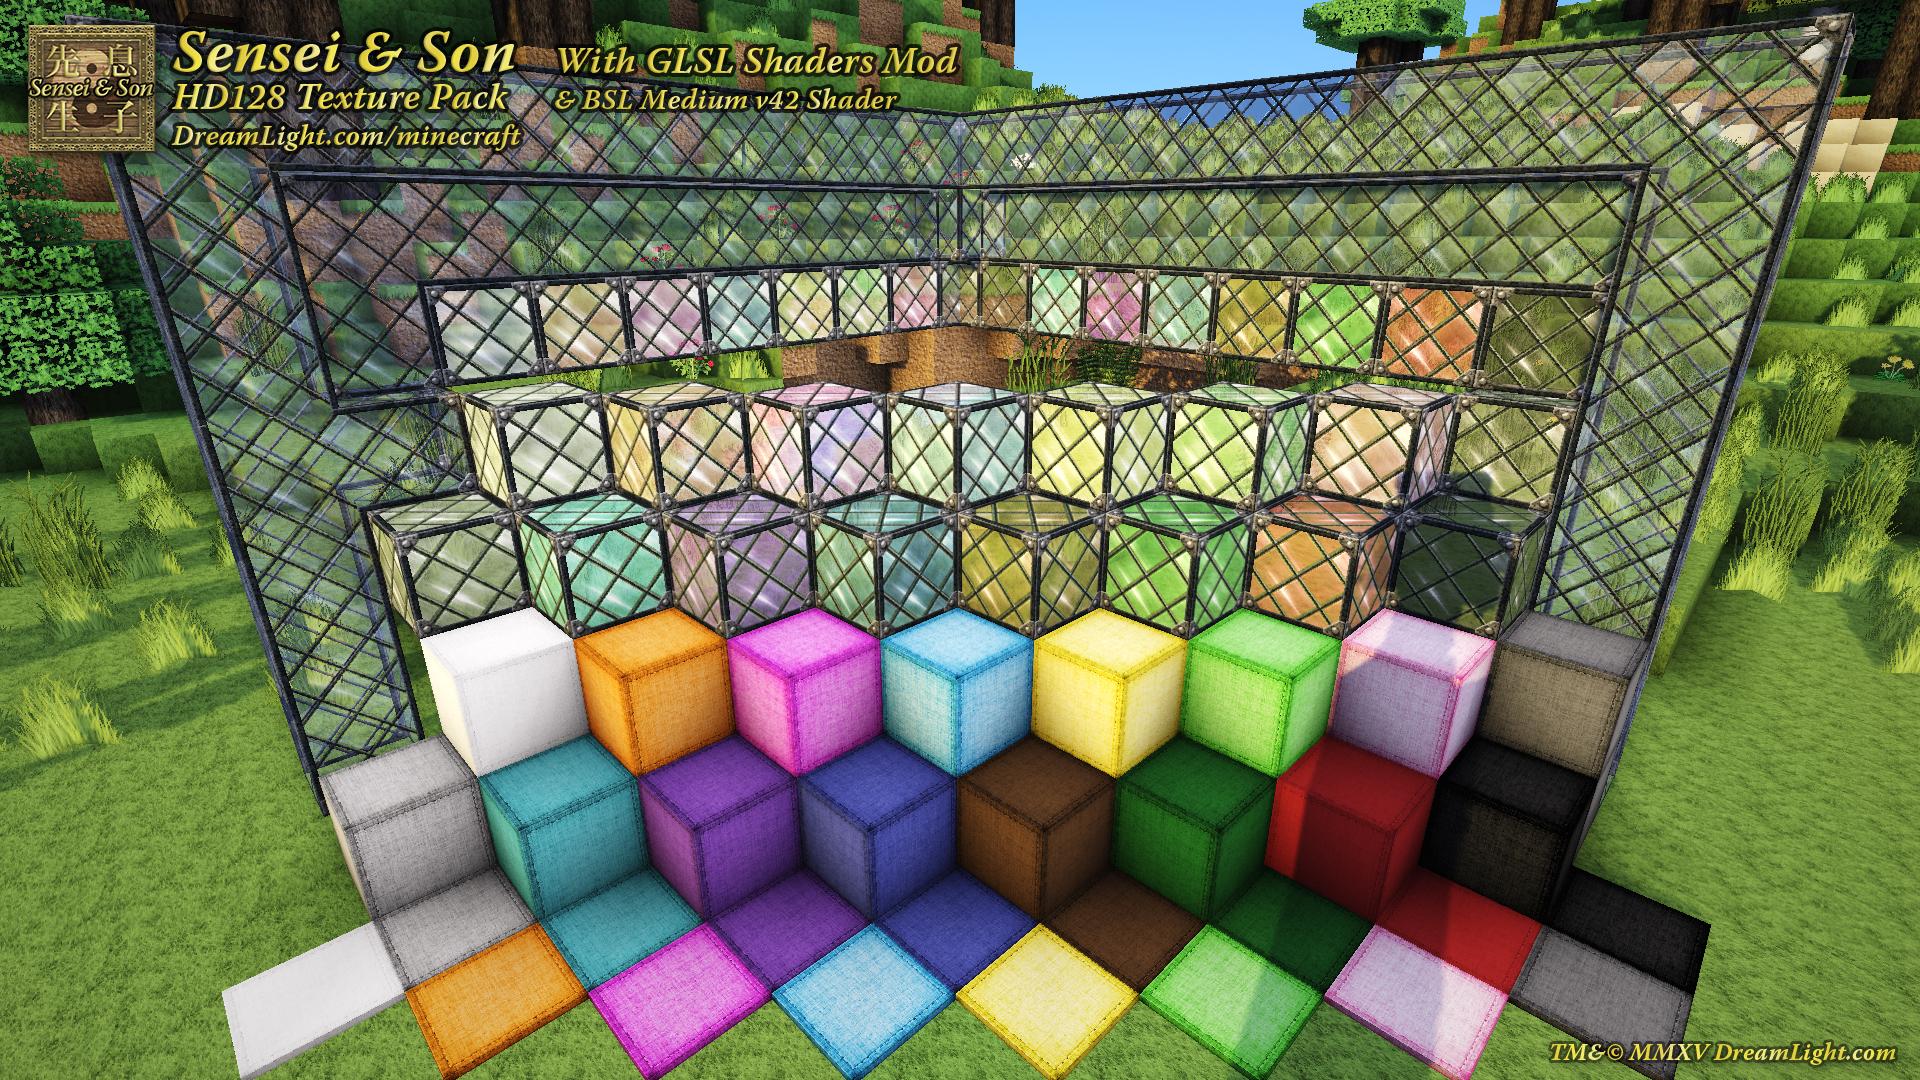 Sensei and Son HD128 Minecraft Texture Pack - DreamLight.com - Boston, MA